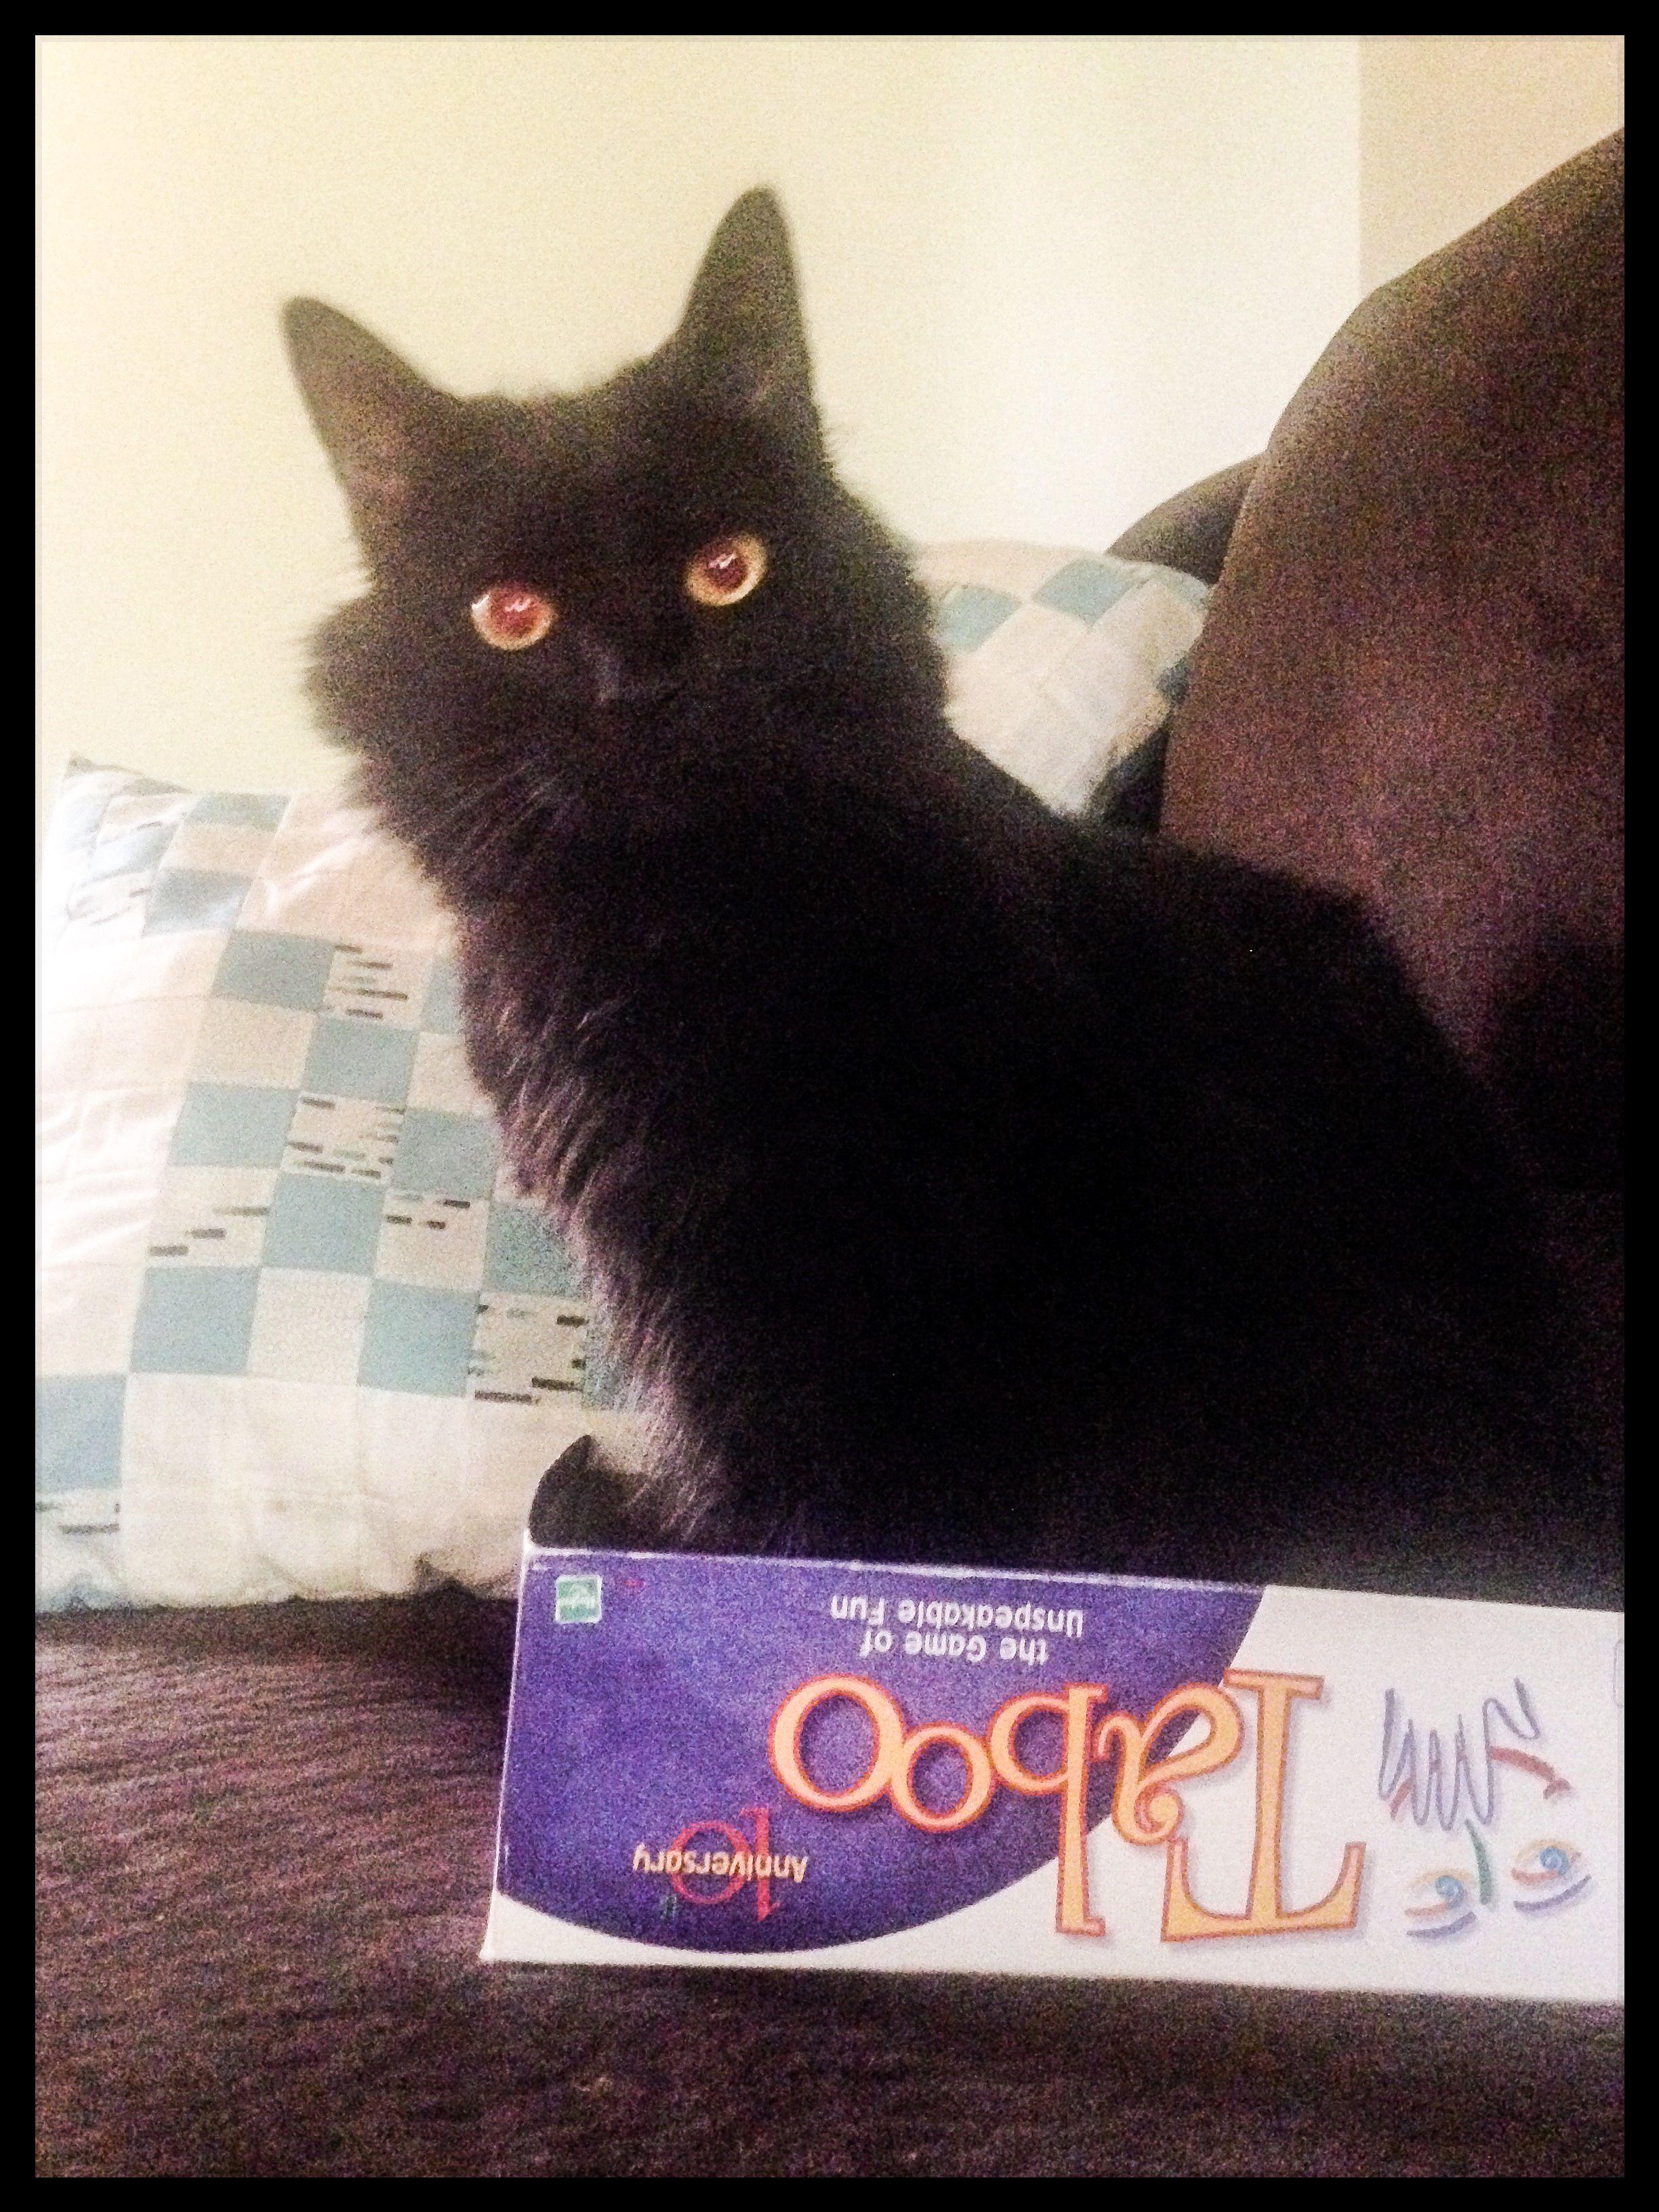 Black cat Salem in Taboo game lid.